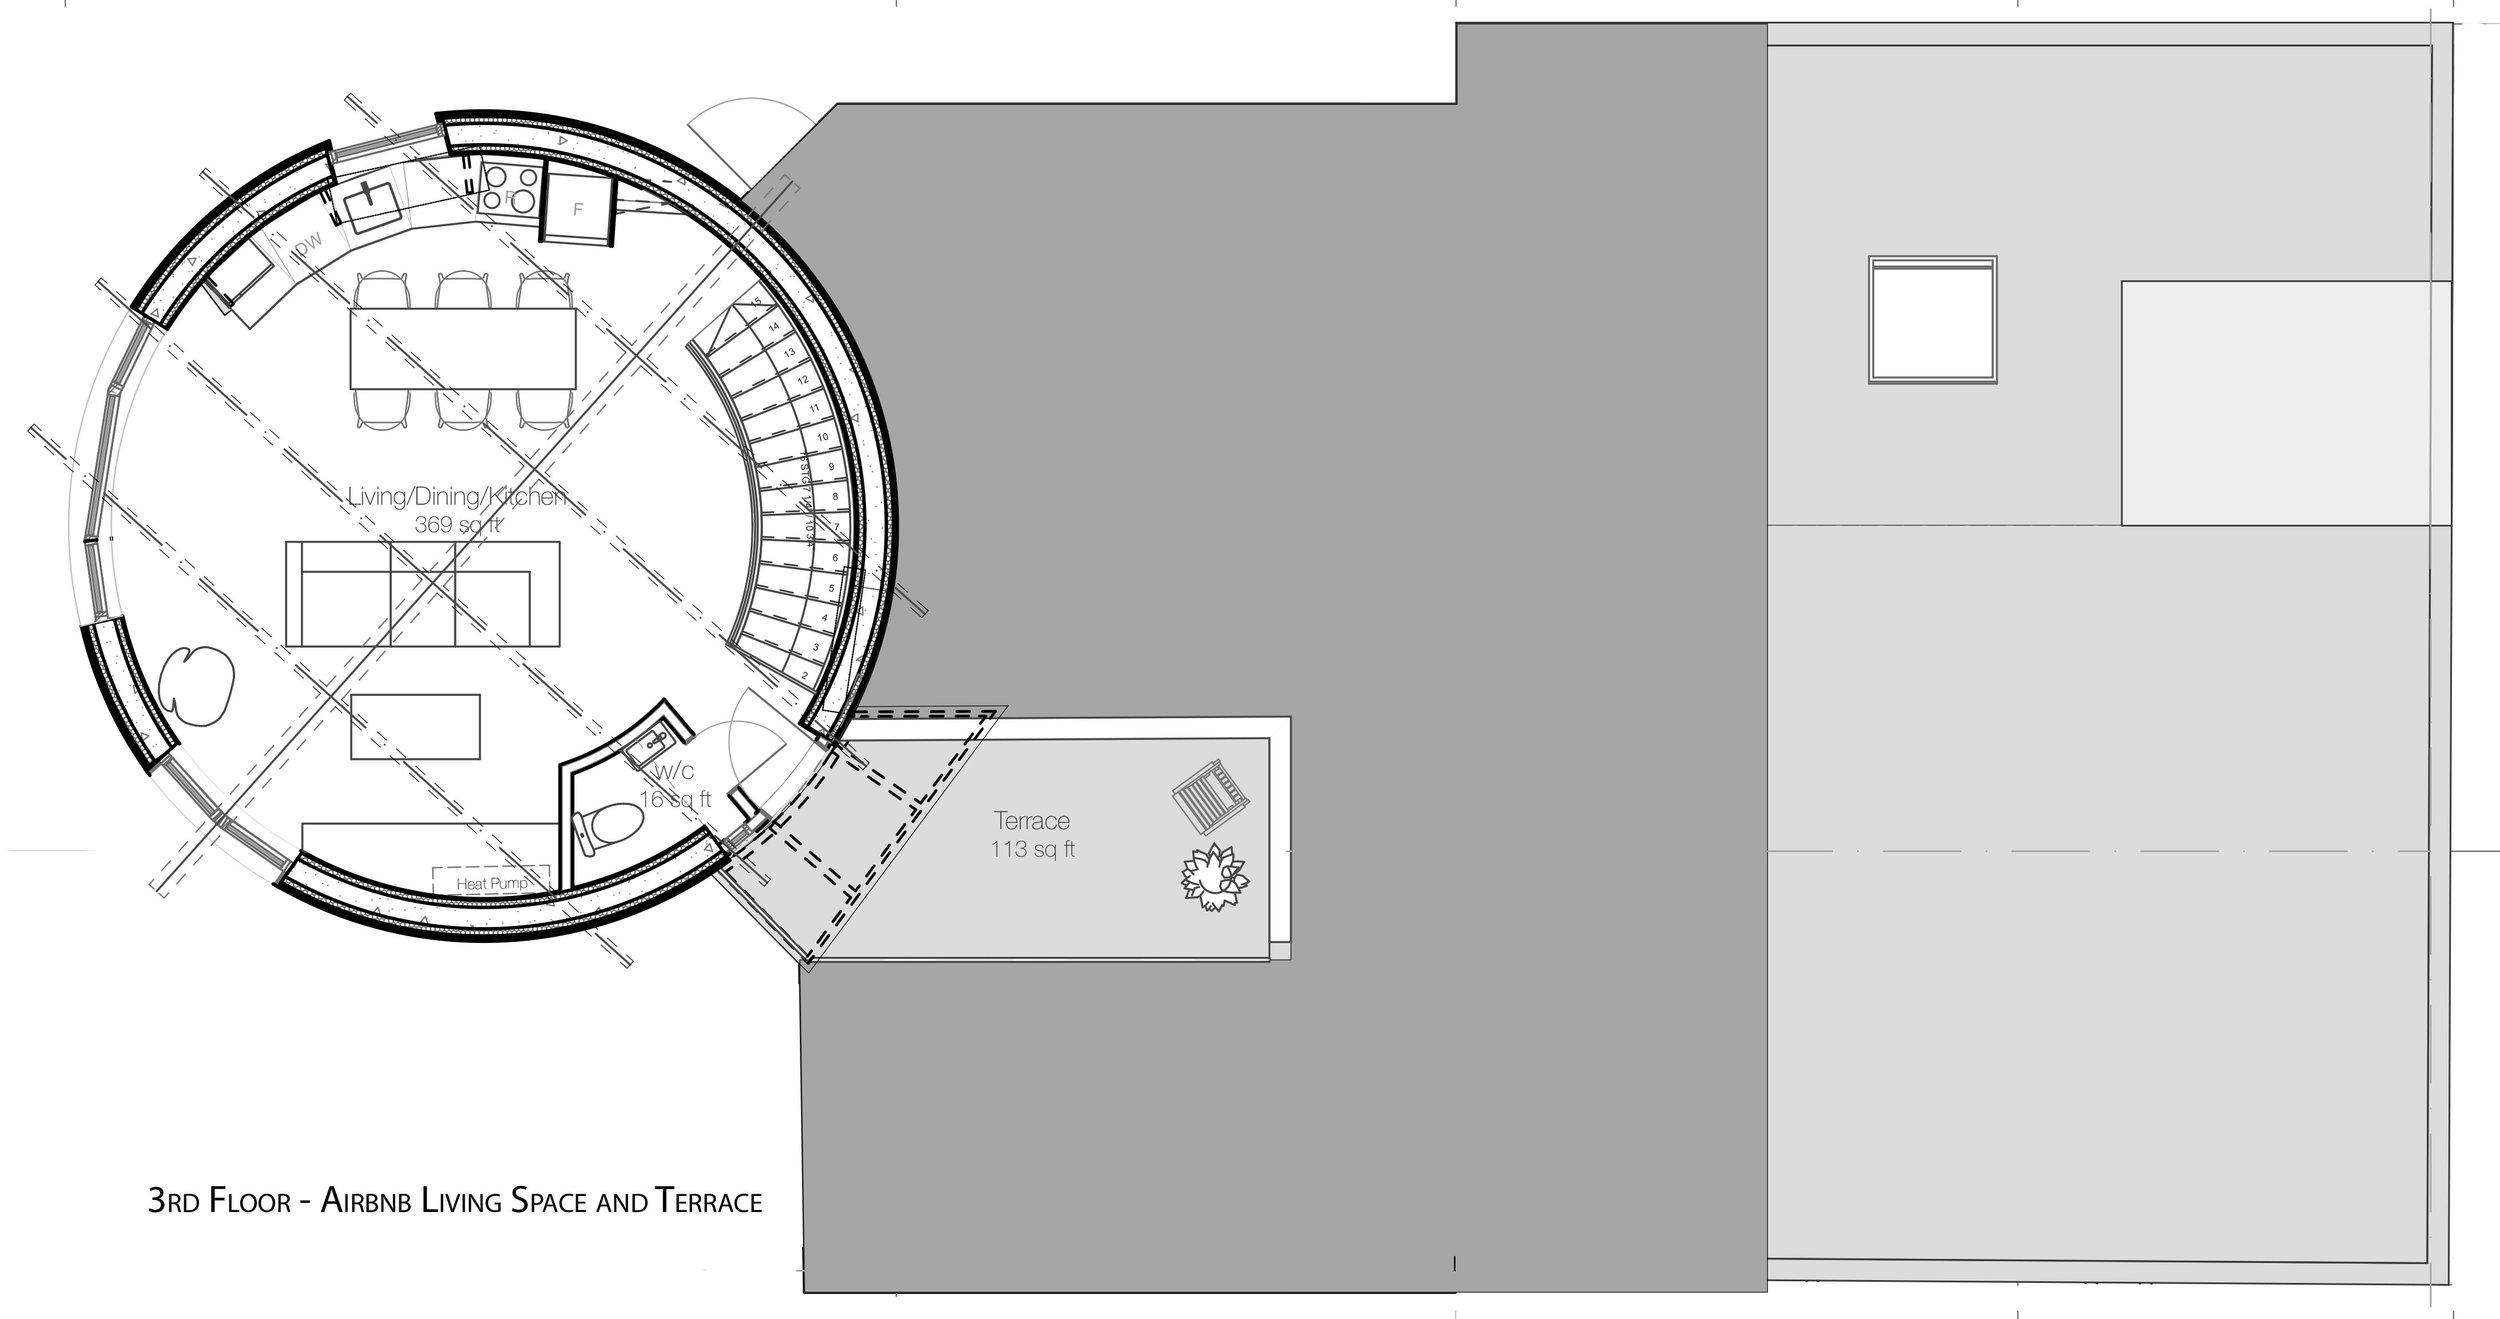 3rd floor plans.jpg